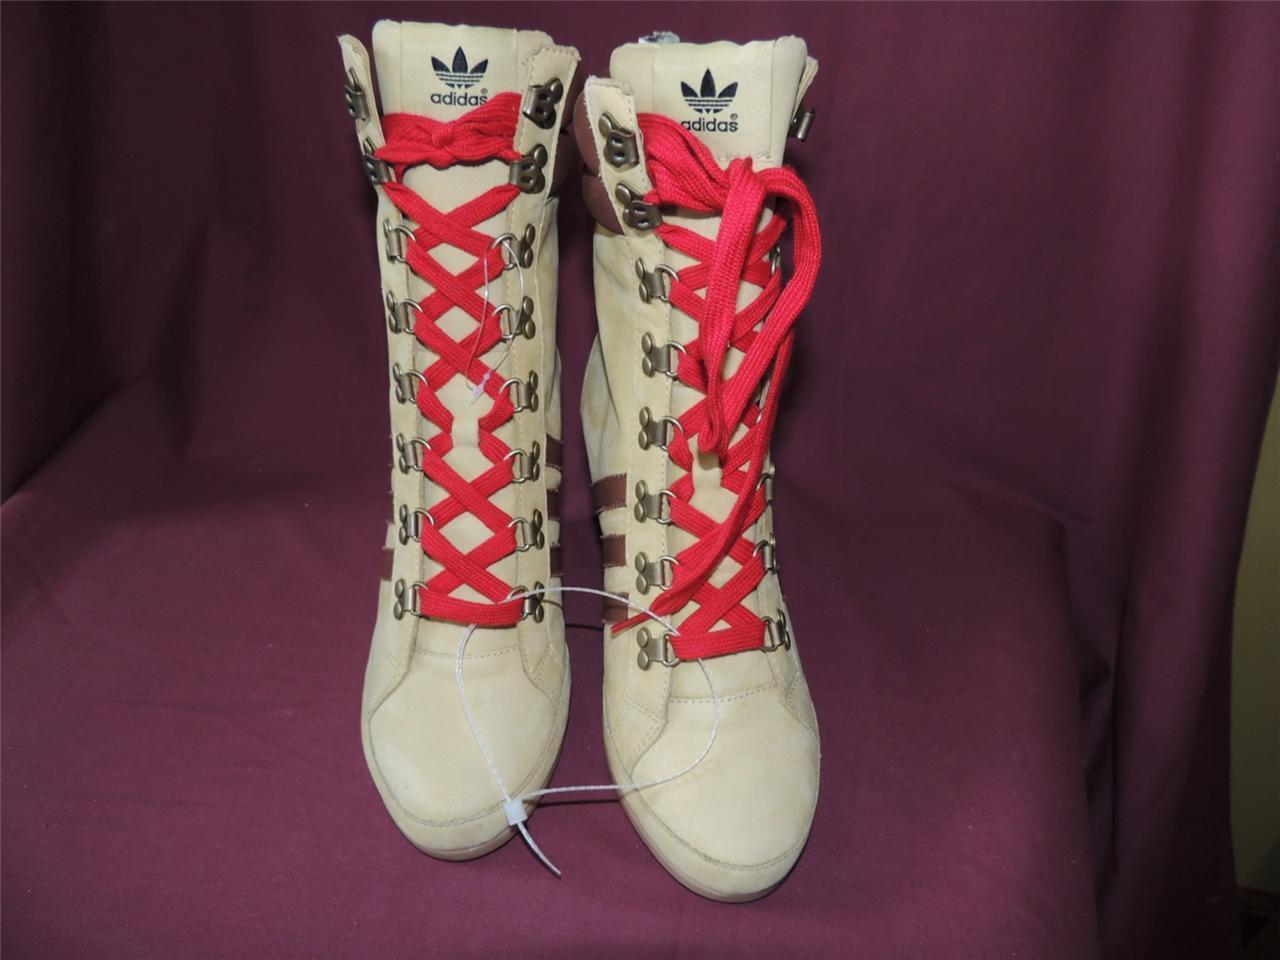 Adidas Originals JS Jeremy Scott Hiking Wedge OBYO Q22917 NEW  Authentic